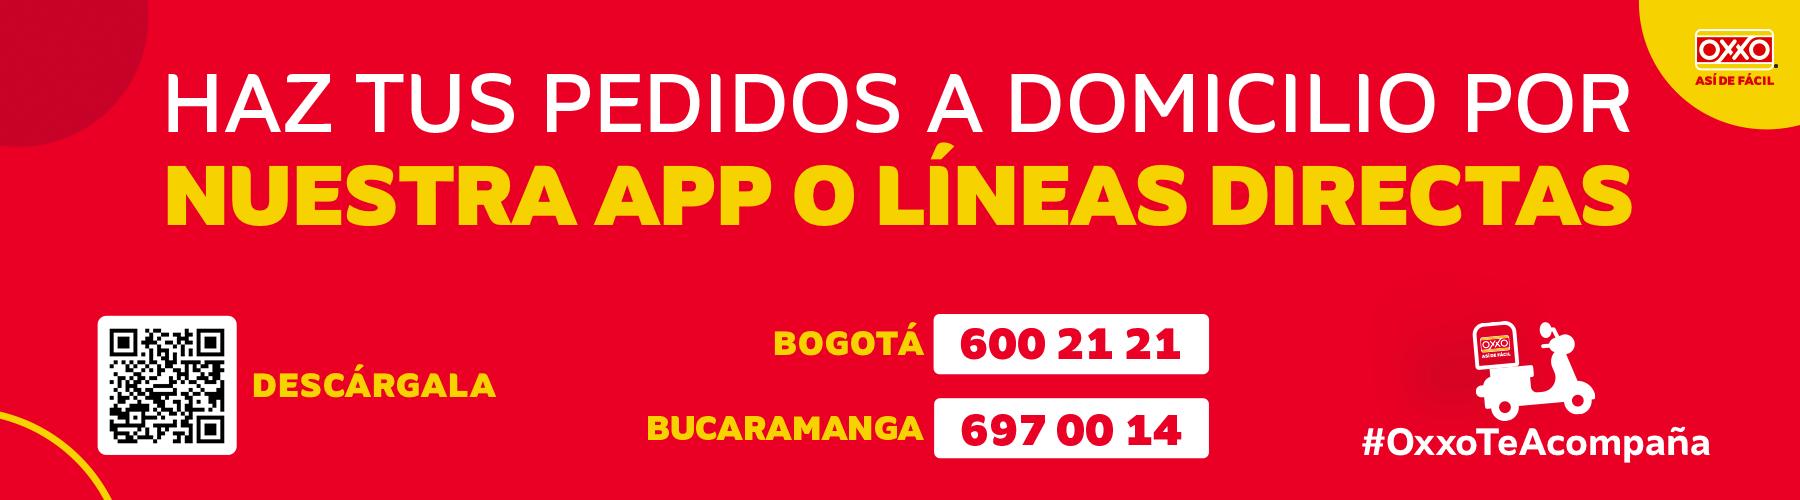 OXXO Colombia WhatsApp P9 2020